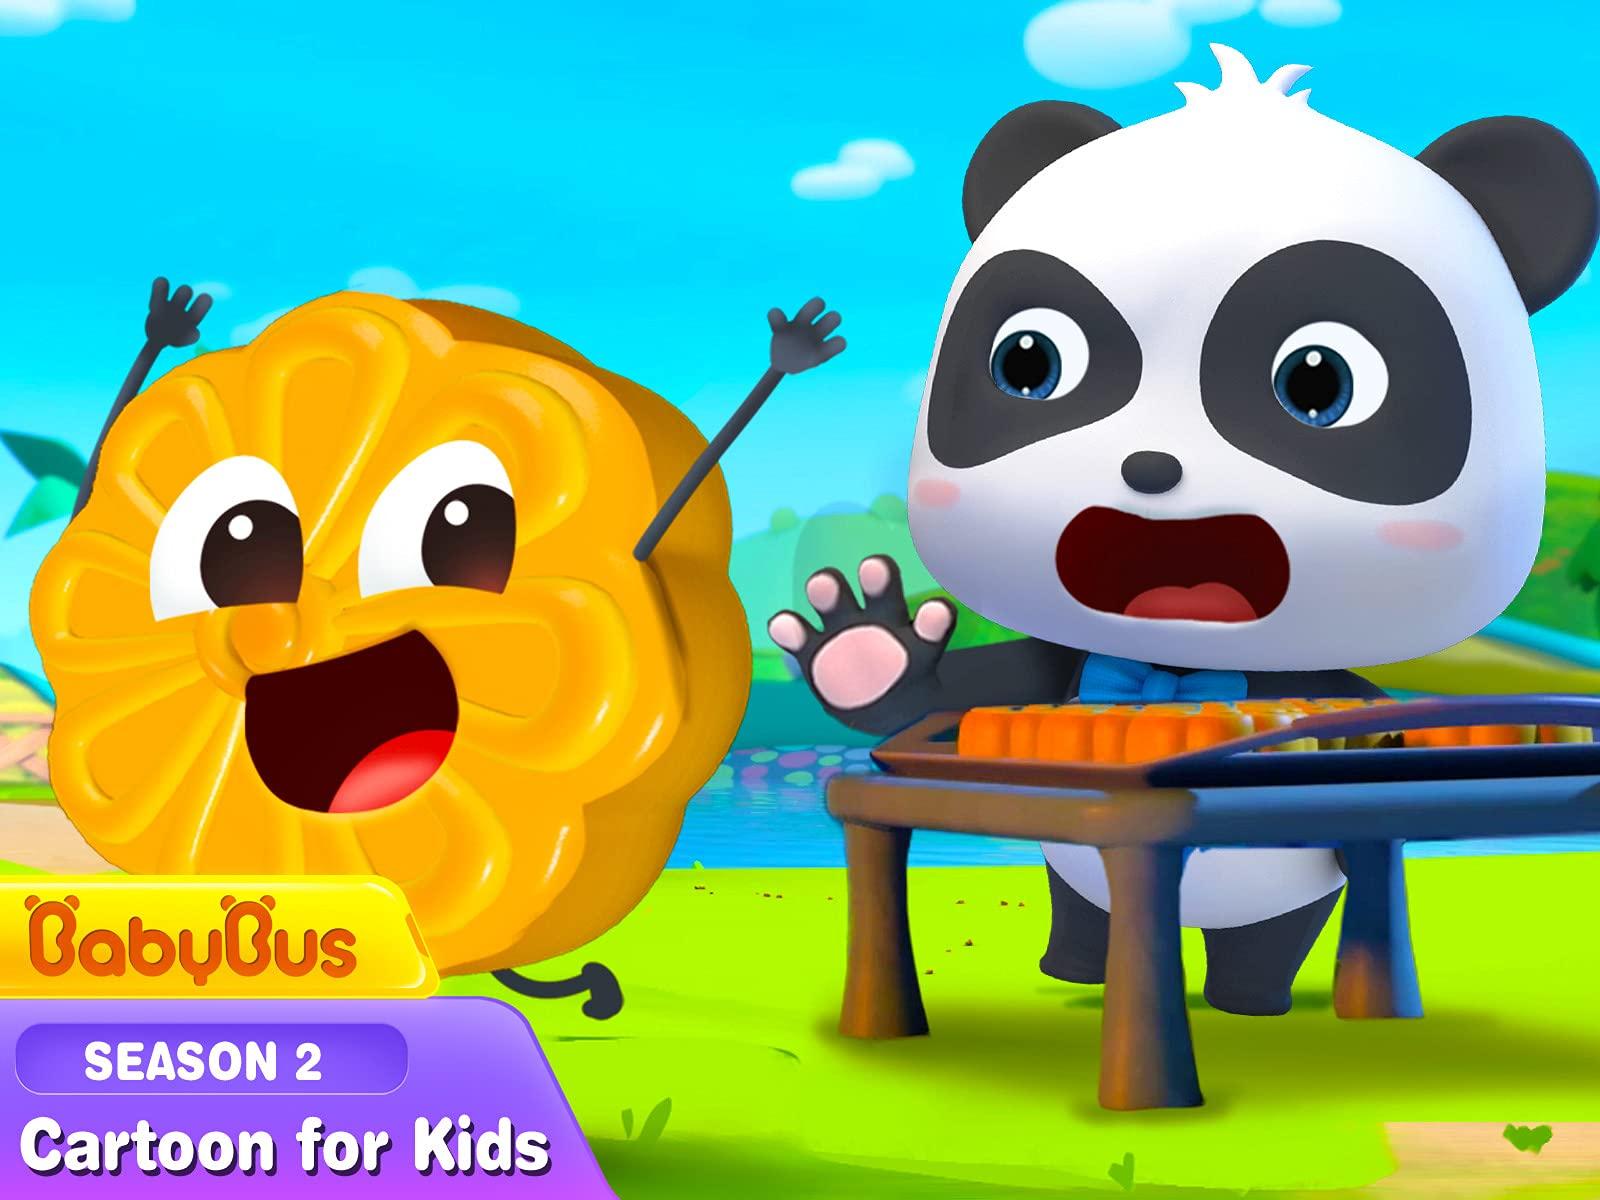 BabyBus - Cartoon for Kids on Amazon Prime Video UK